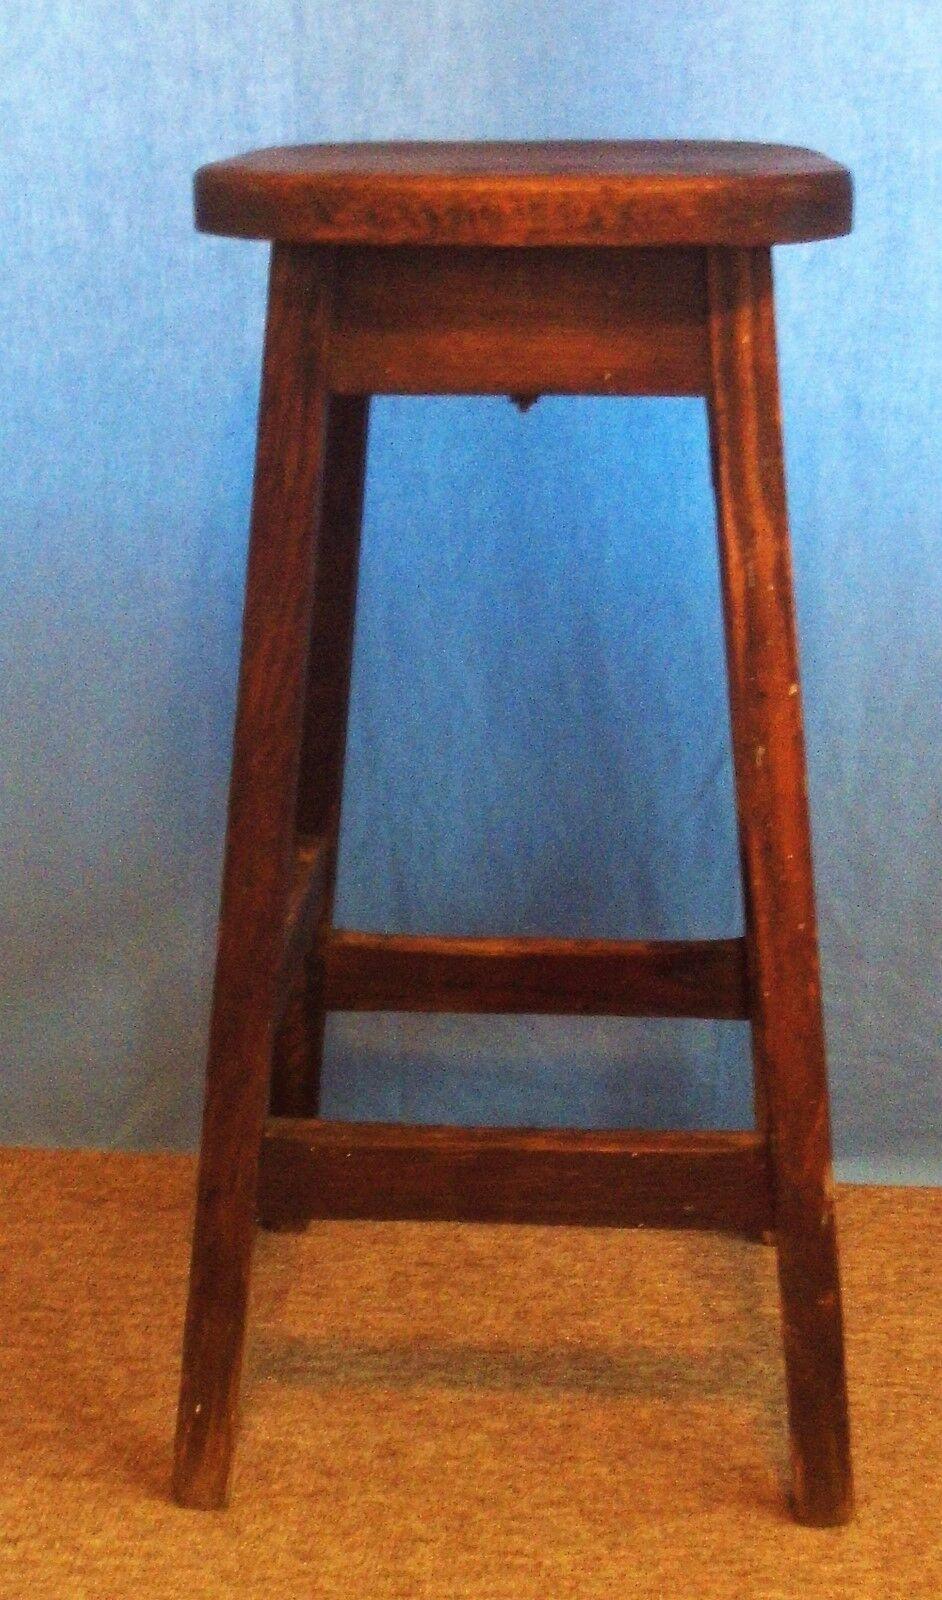 "Antique Primitive Solid Wood Oak 4 Legged Stool ""Very Sturdy"""